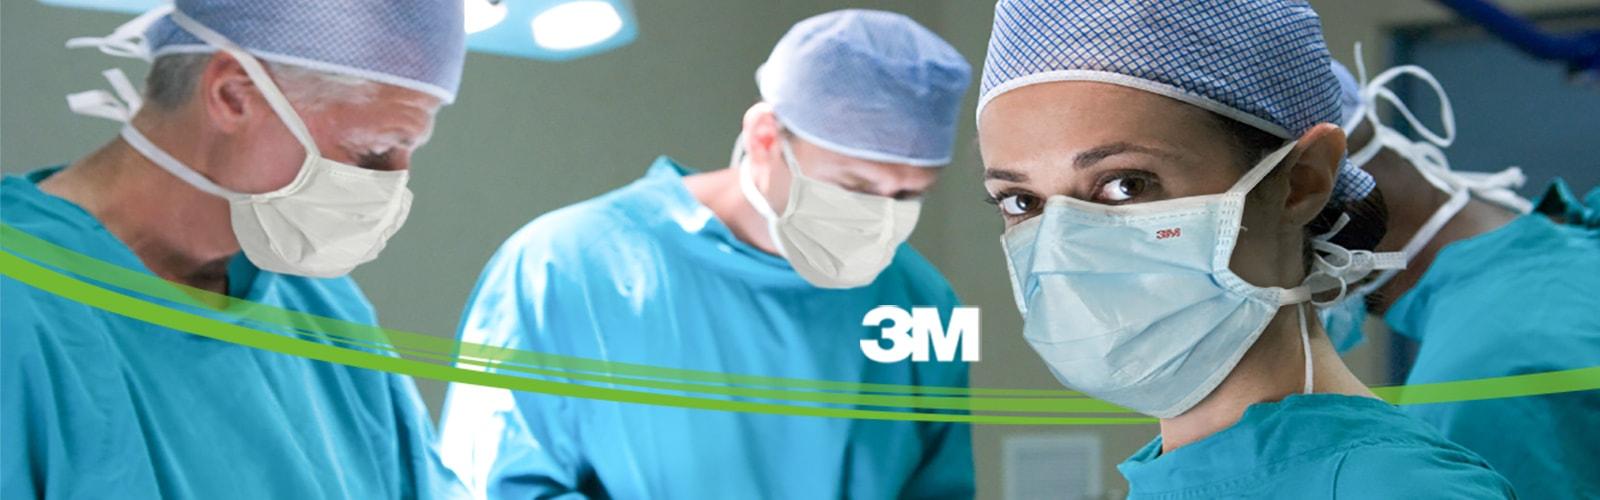 Maska chirurgiczna standardowa 3M